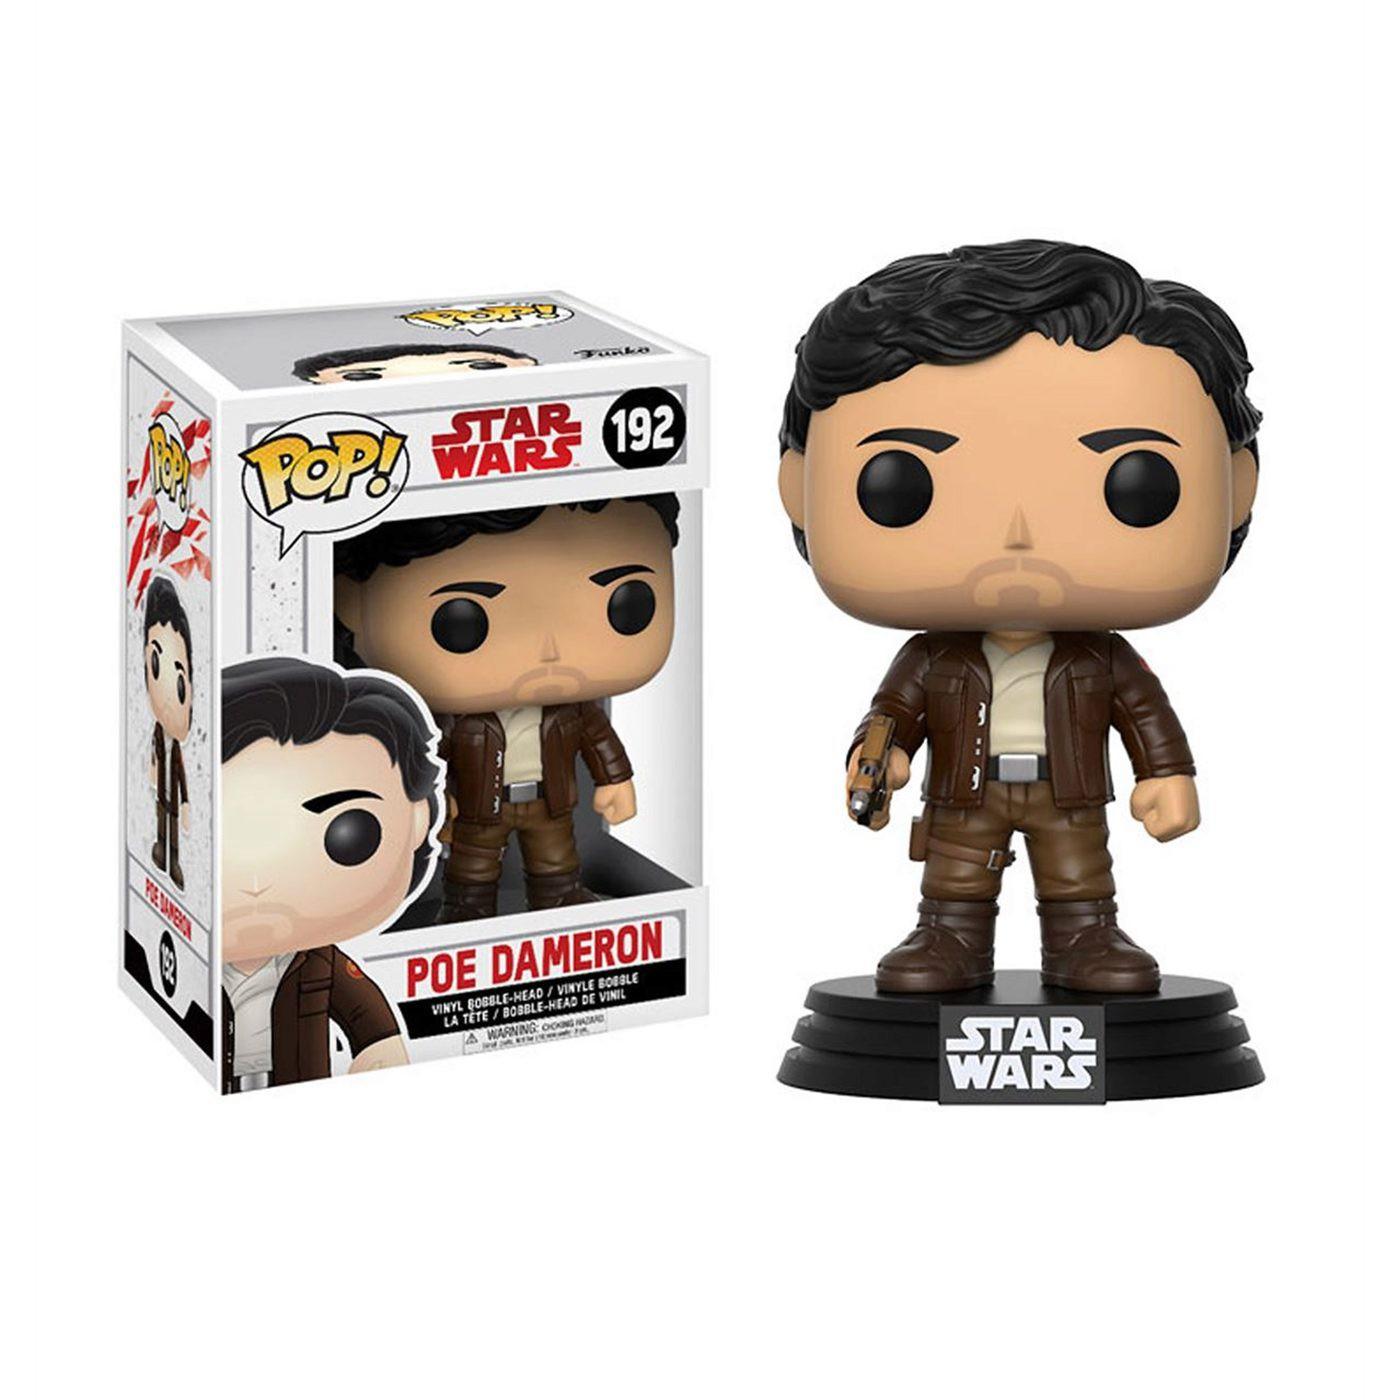 Star Wars Last Jedi Poe Dameron Funko Pop Bobble Head